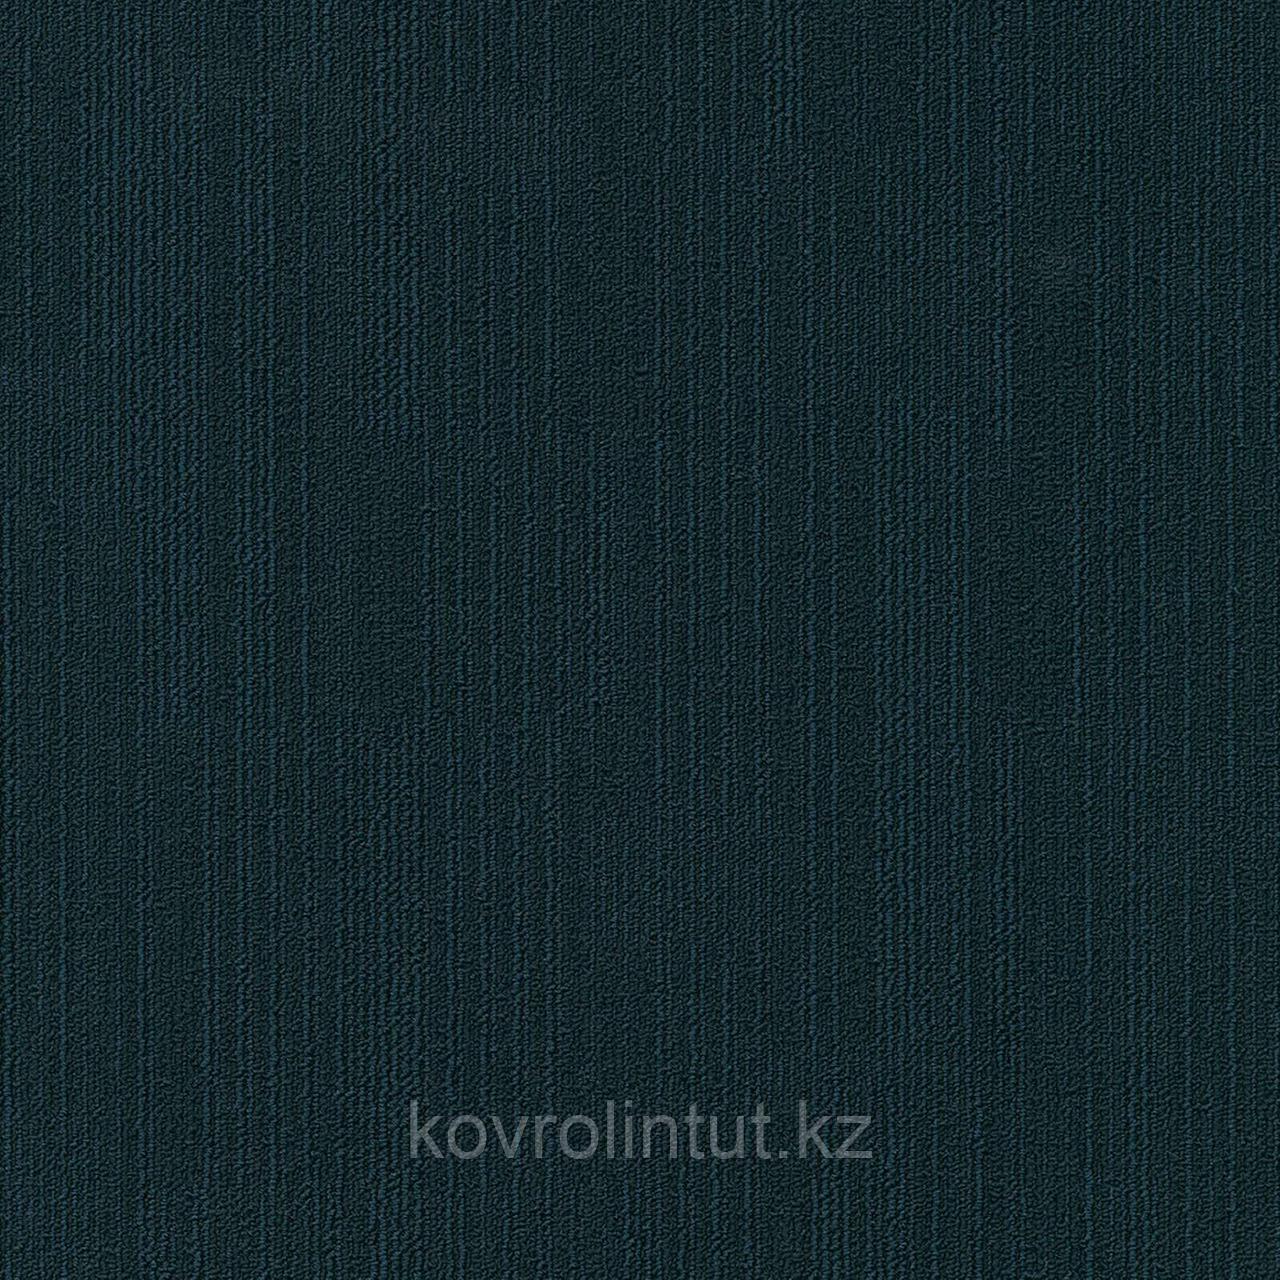 Плитка ковровая Modulyss Fashion 671, 100% PA